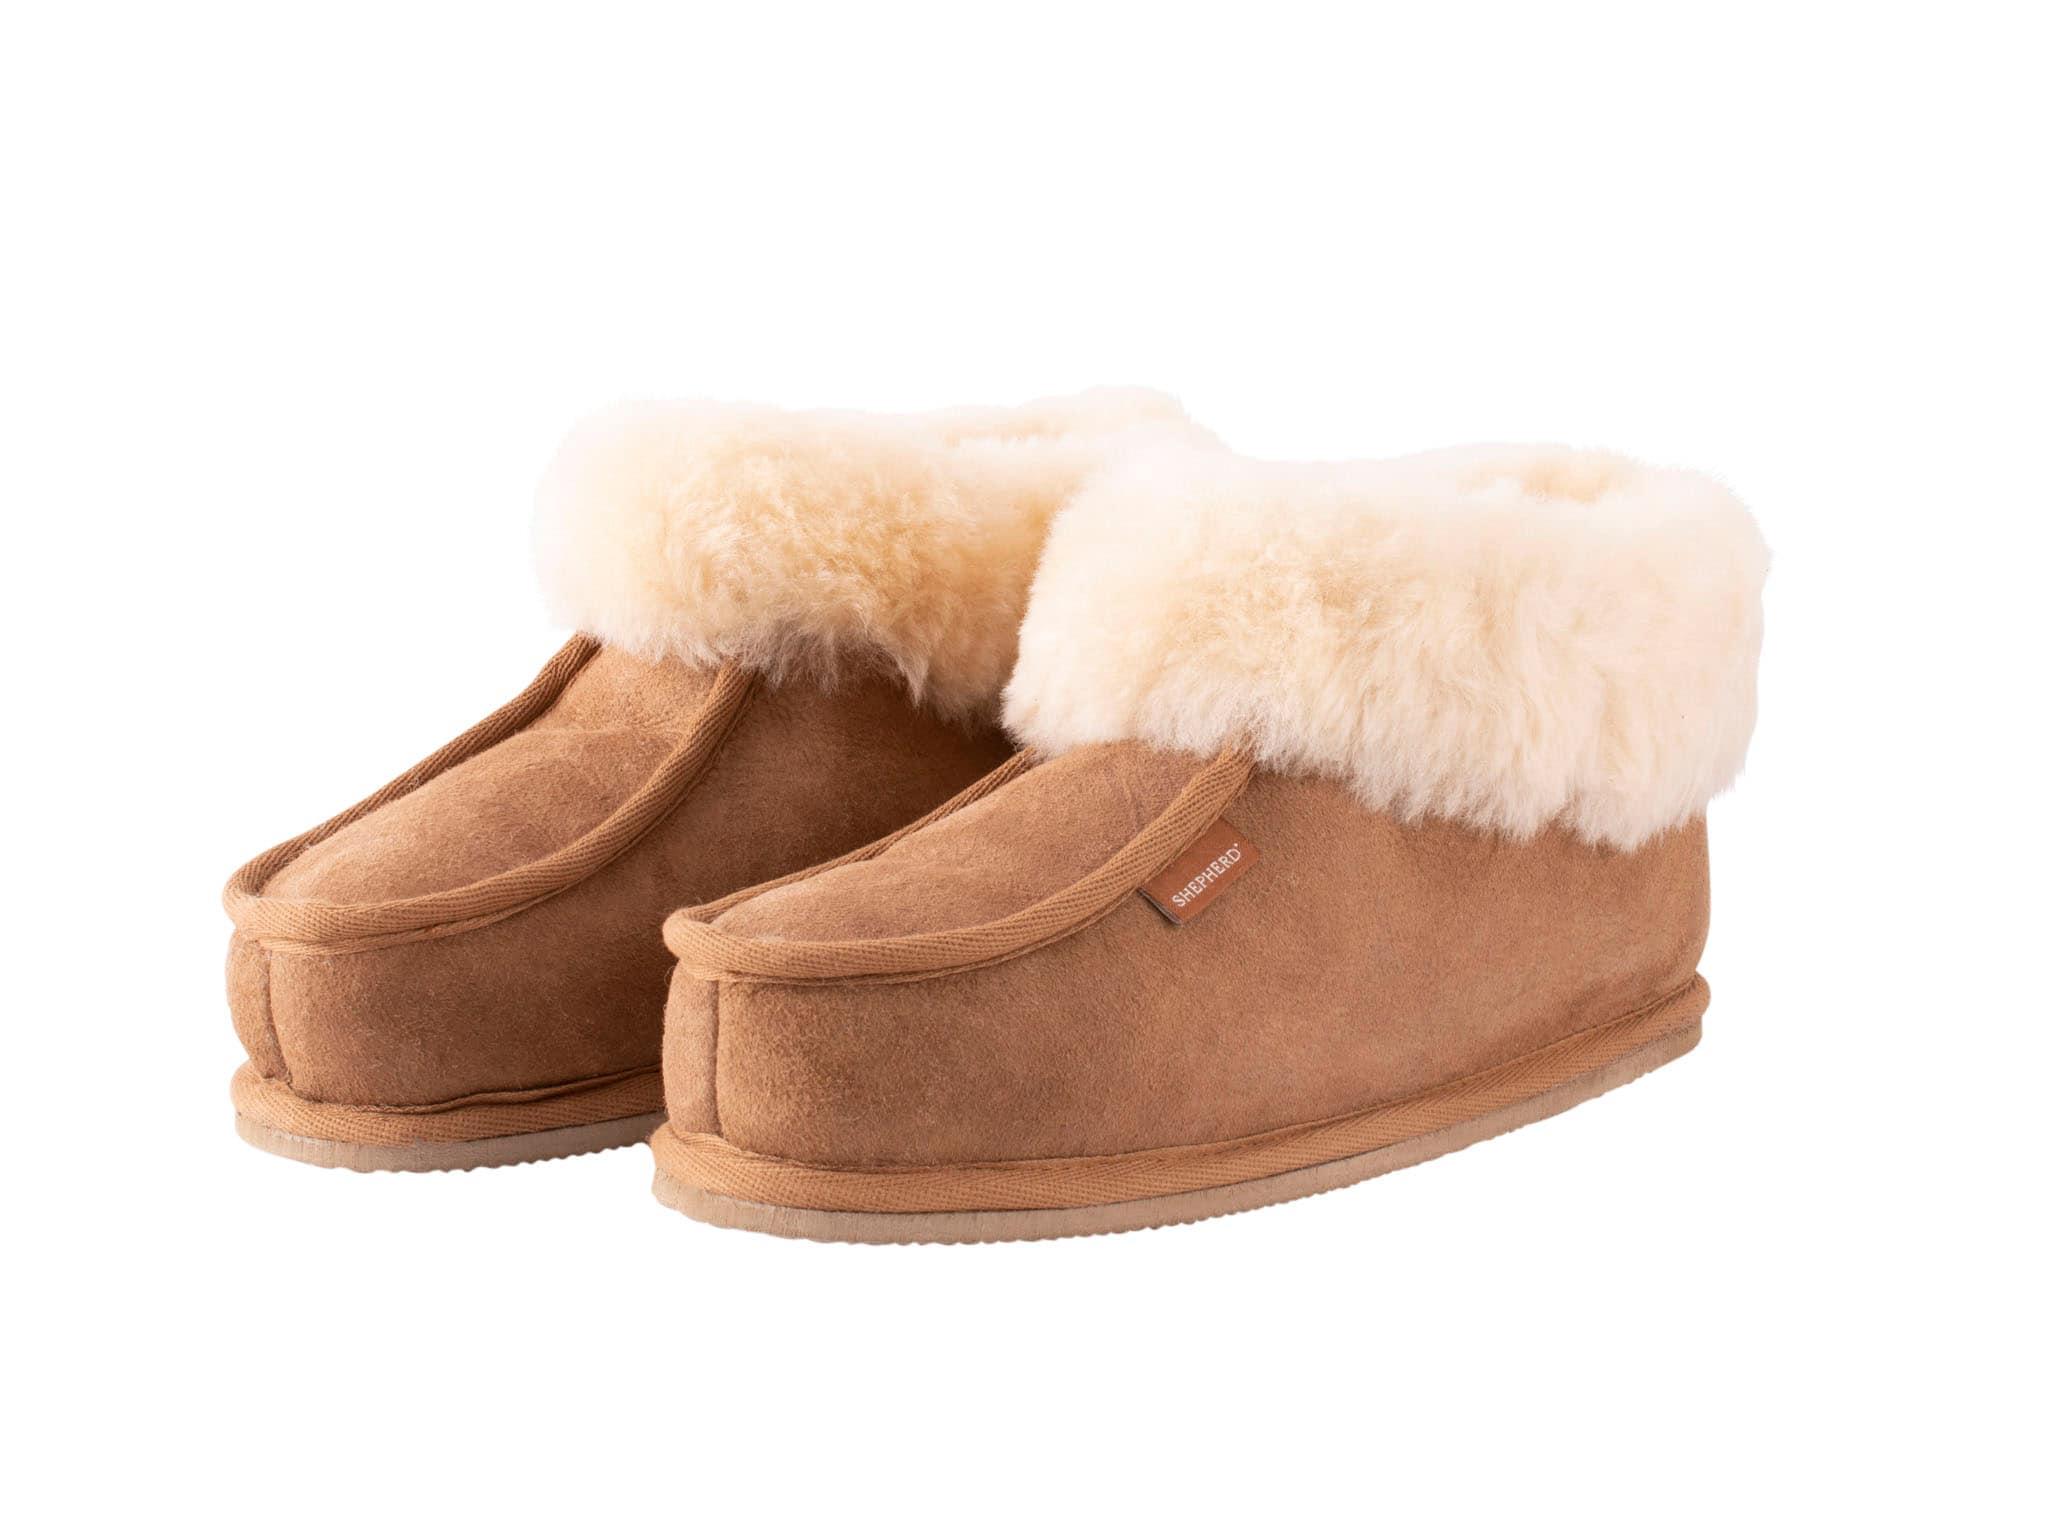 Sheepherd Lena slippers